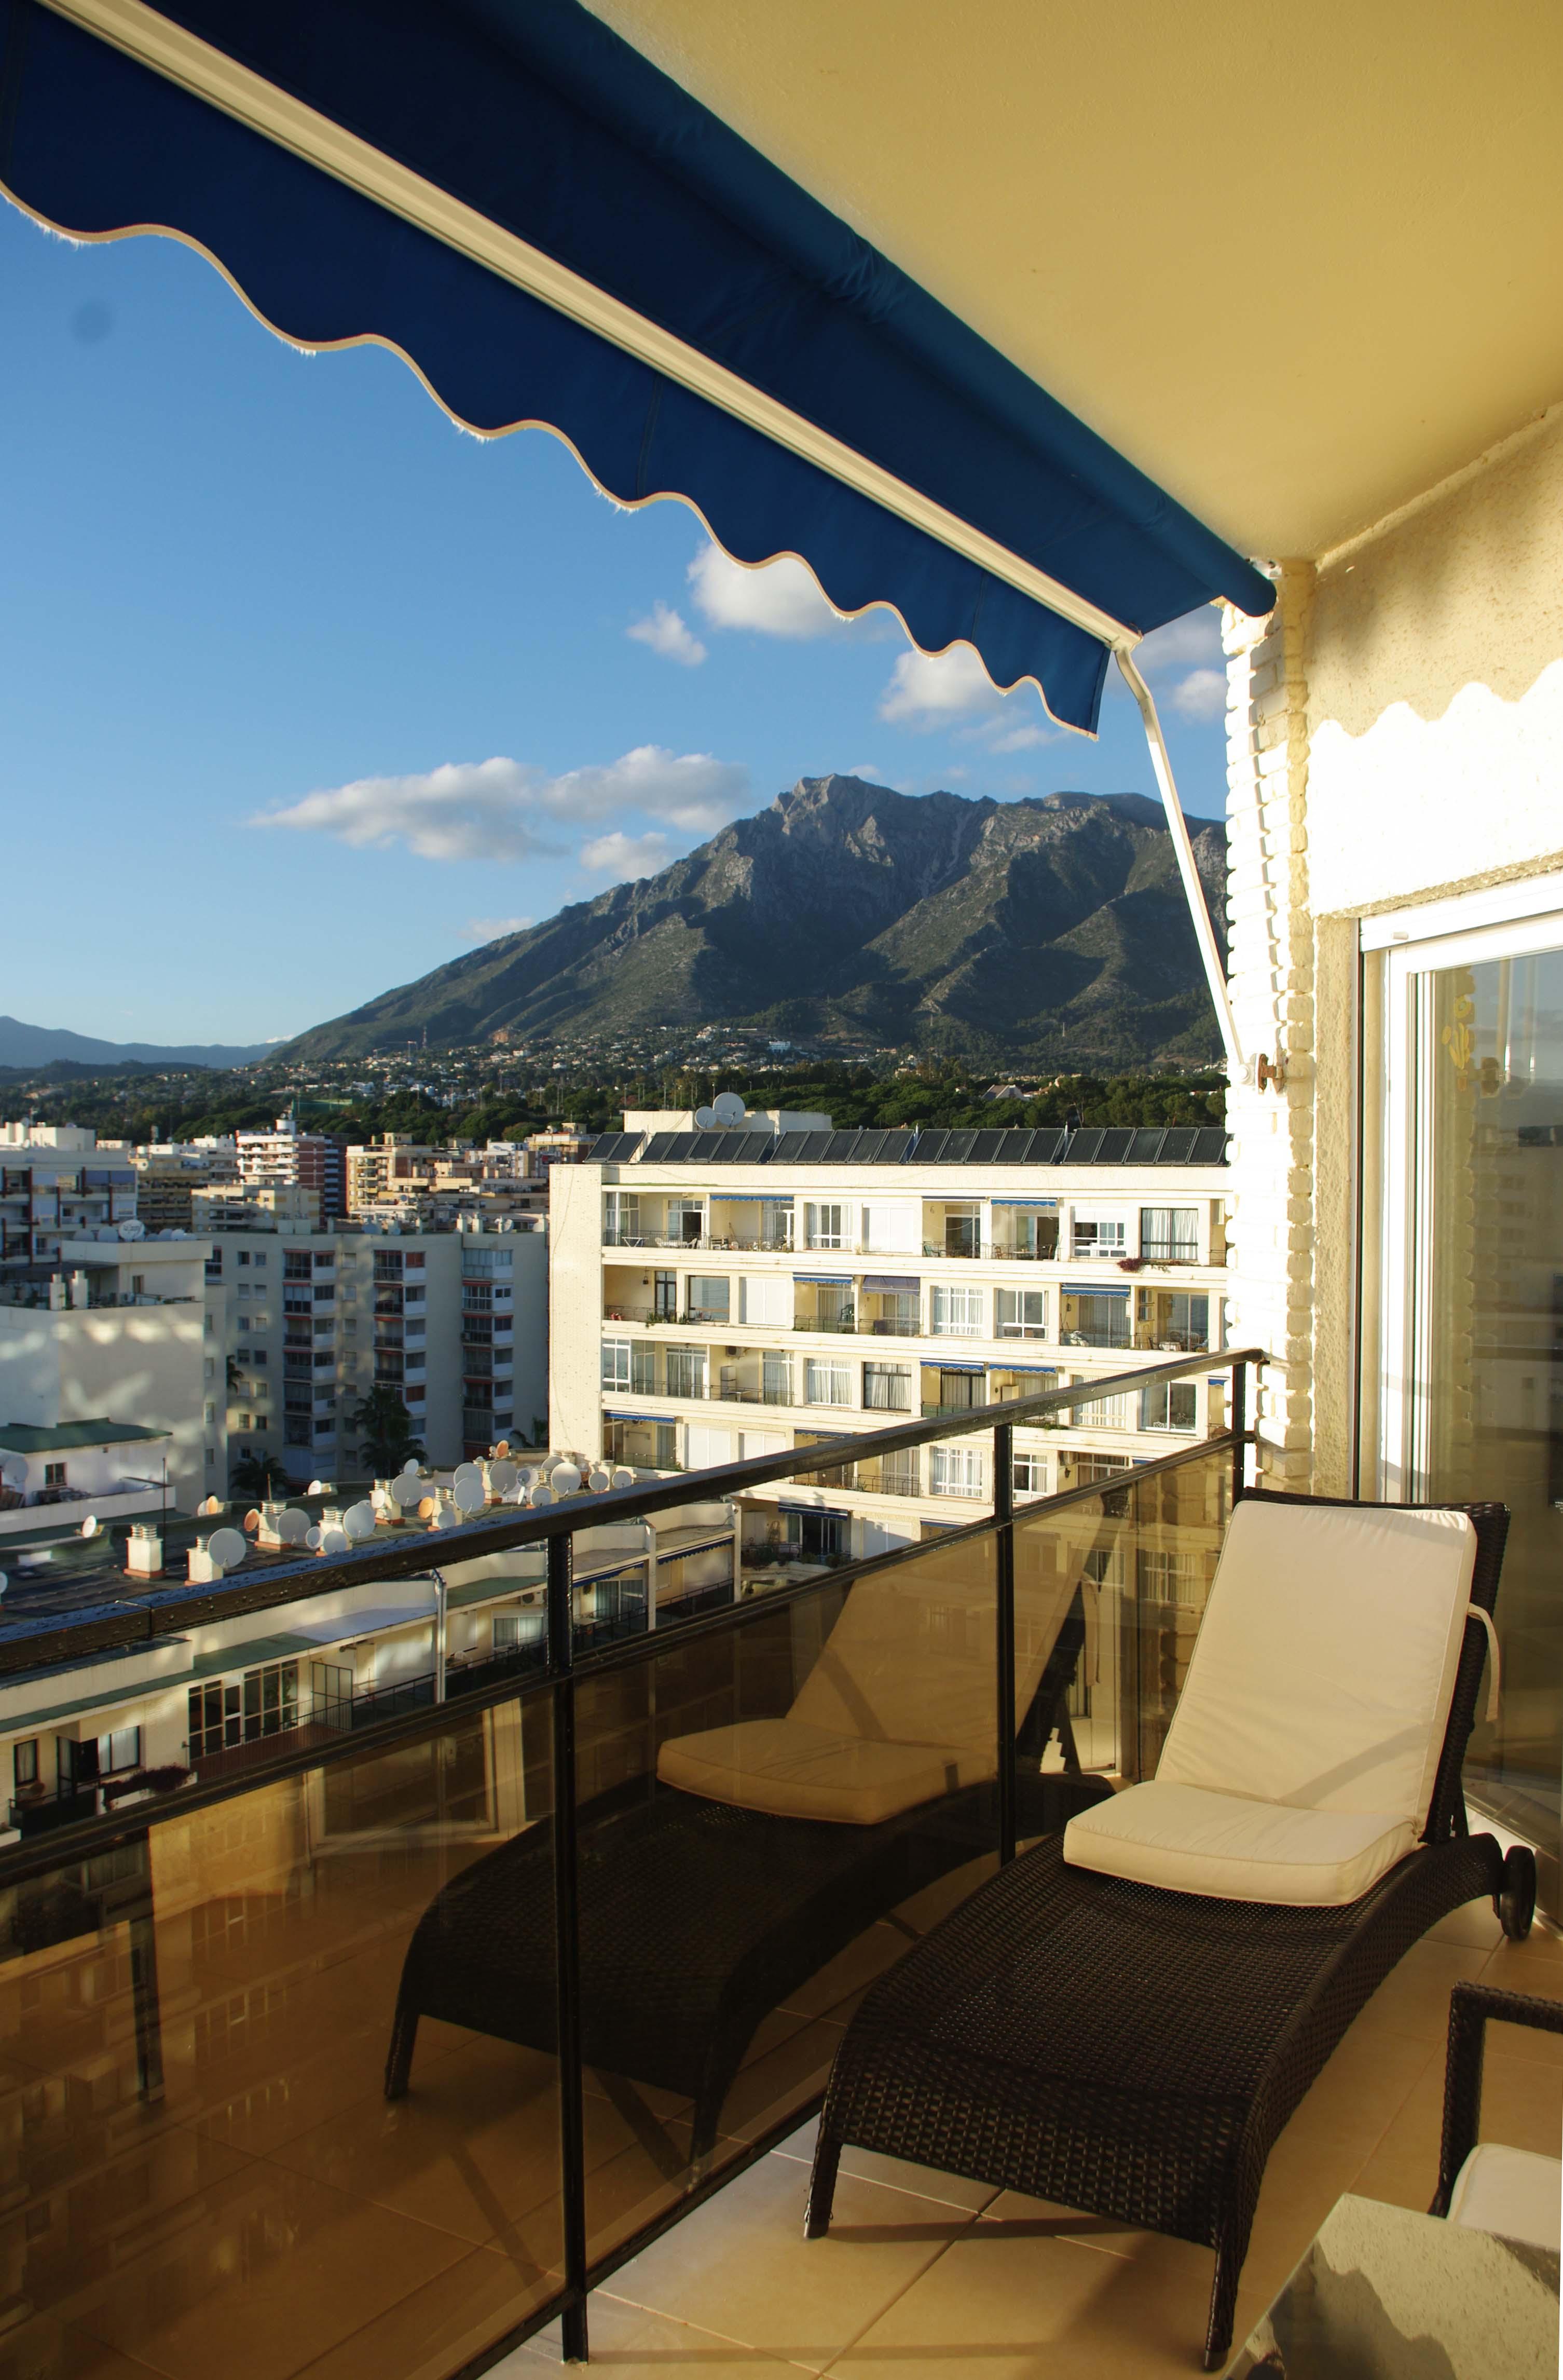 Skol apartments, Marbella - apartment 811A -  balcony mountain backdrop